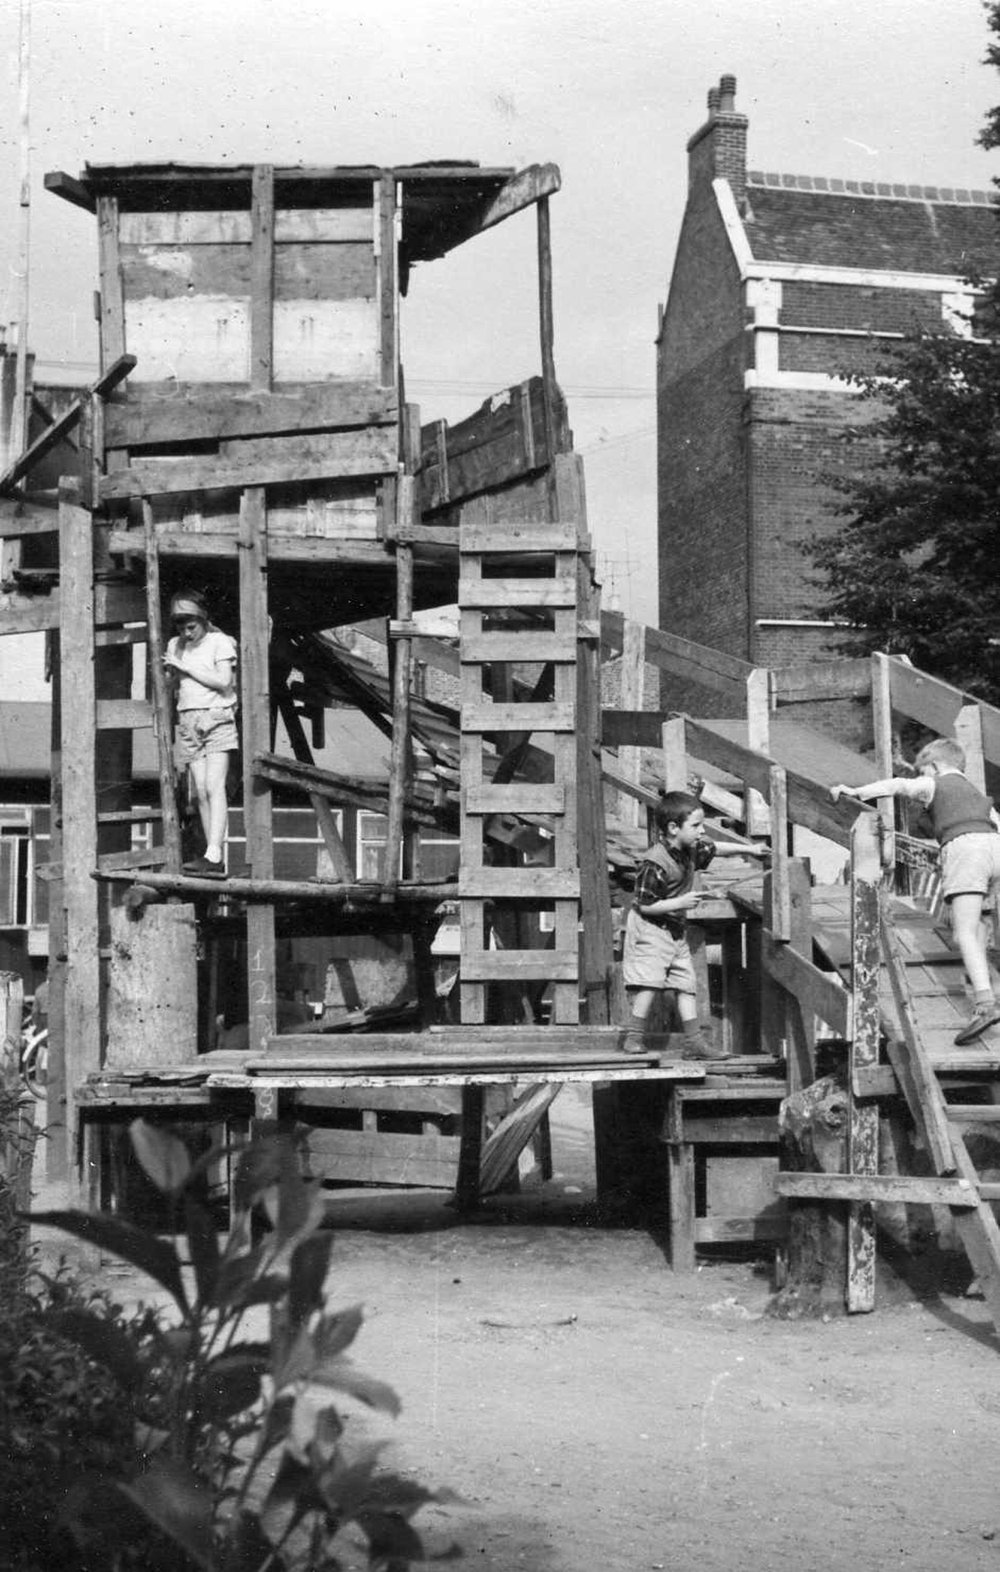 Notting Hill Adventure Playground, London, 1963